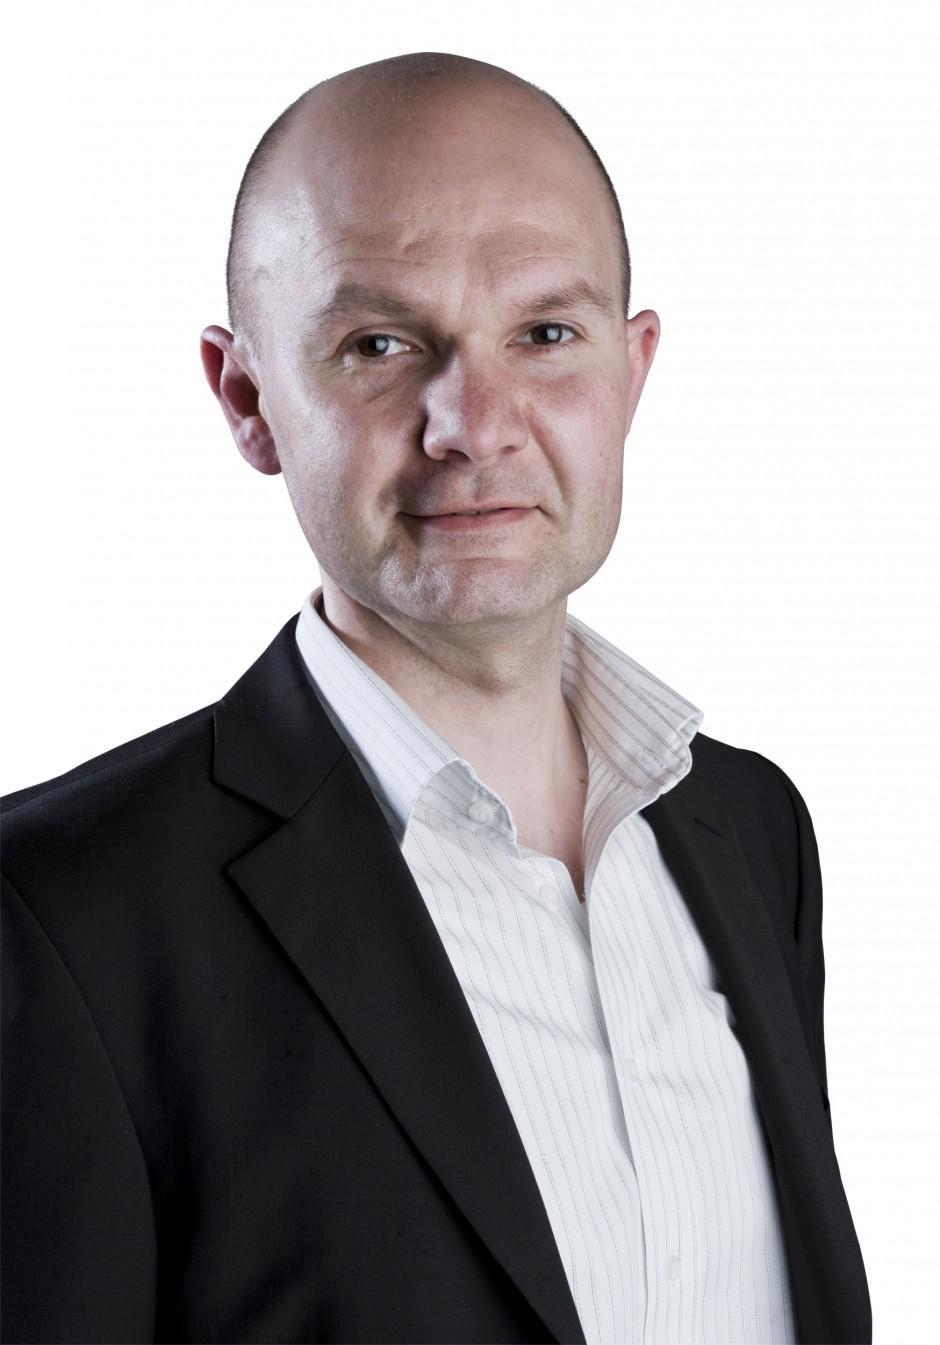 Bernd Sanning, Flexicon: